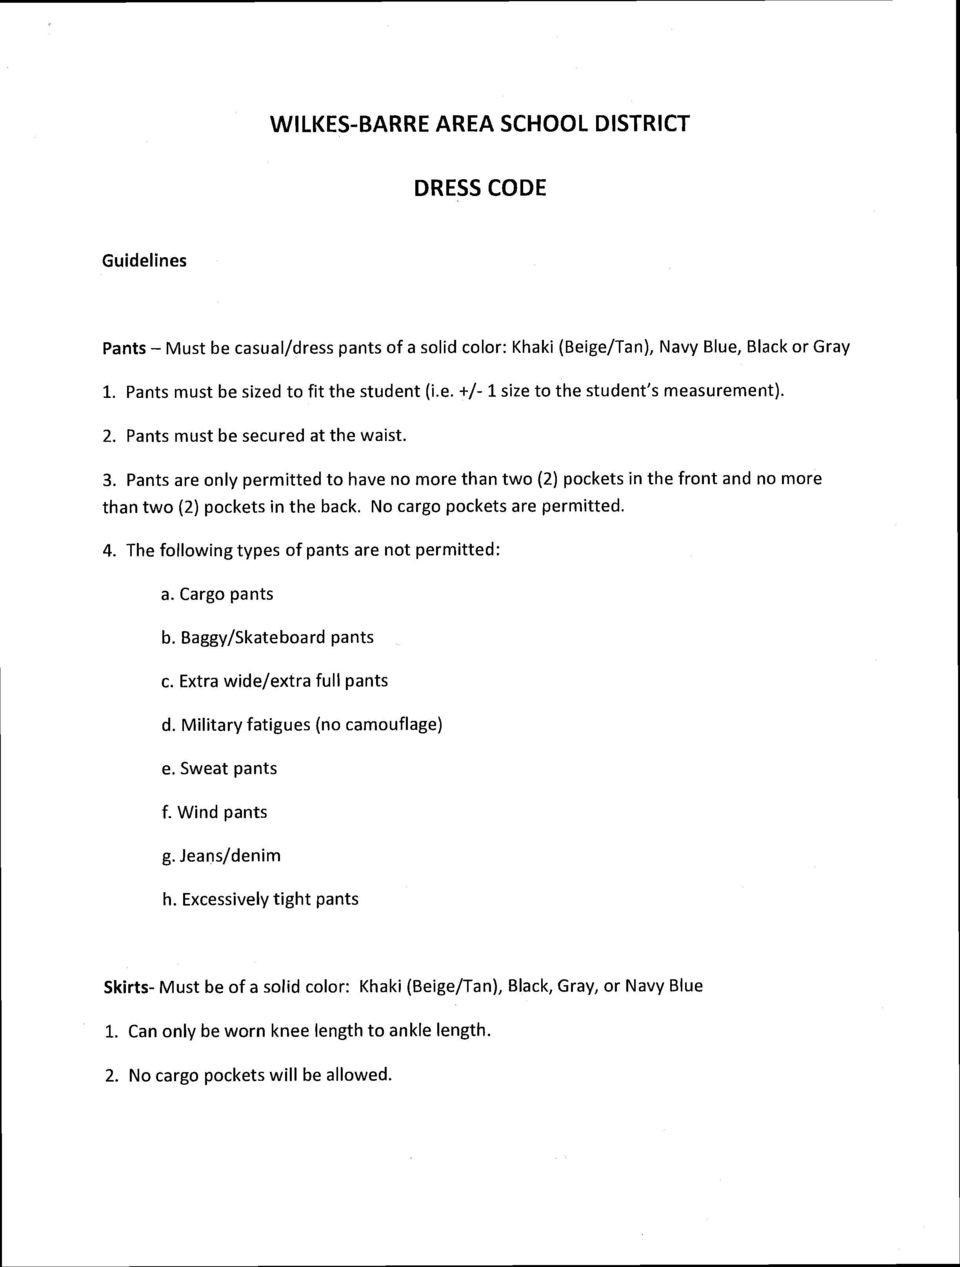 Wilkes Barre Area School District Dress Code – Pdf Free Download Pertaining To Wilkes Barre Area School District Calendar